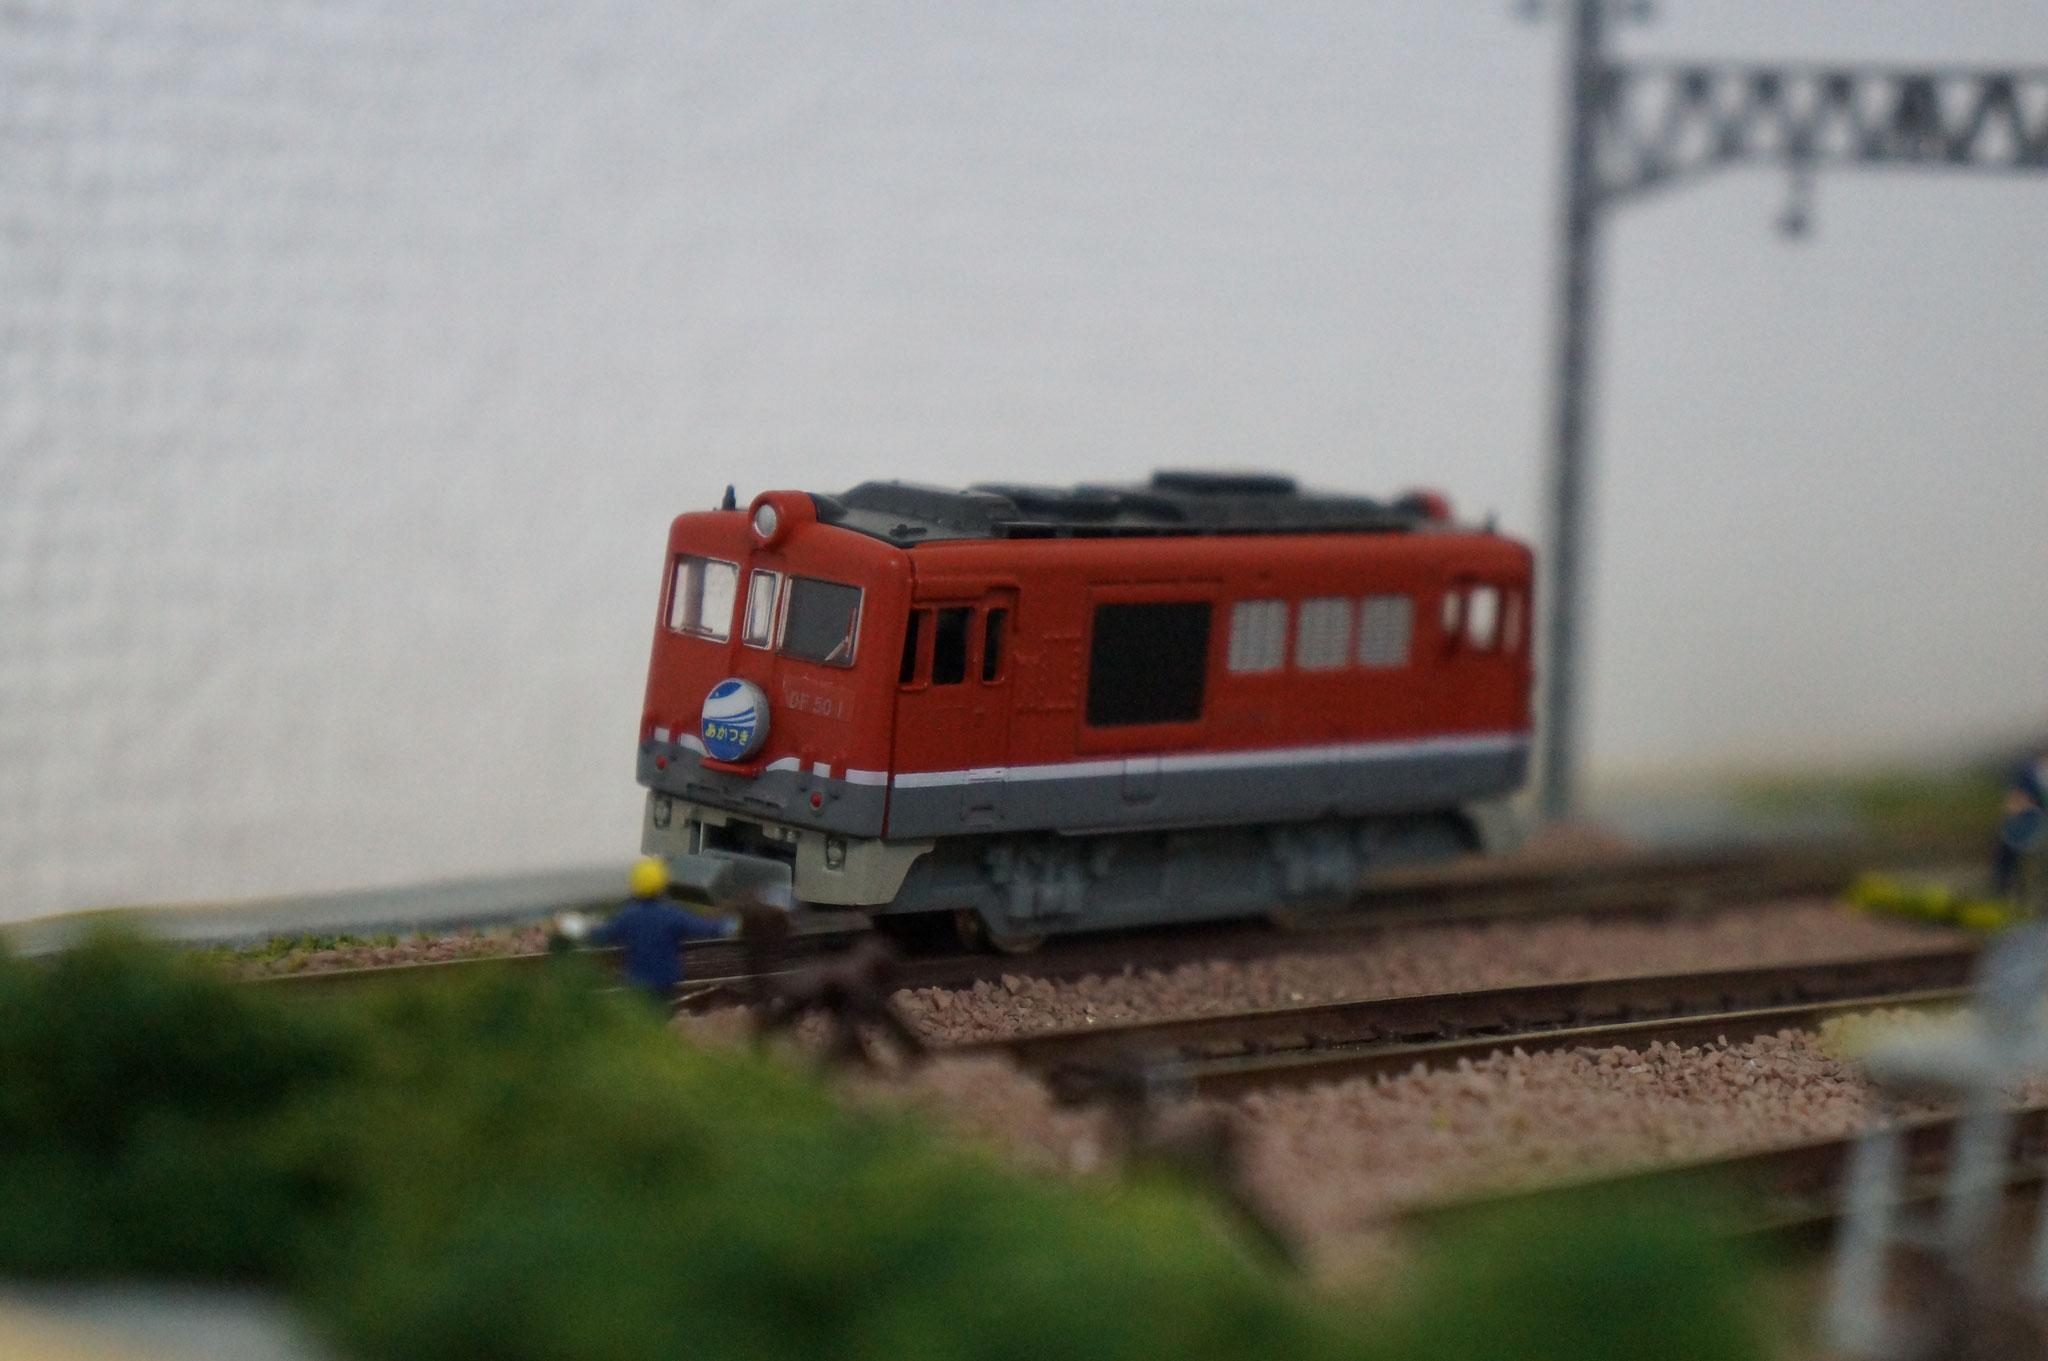 MD55ディーゼル機関車